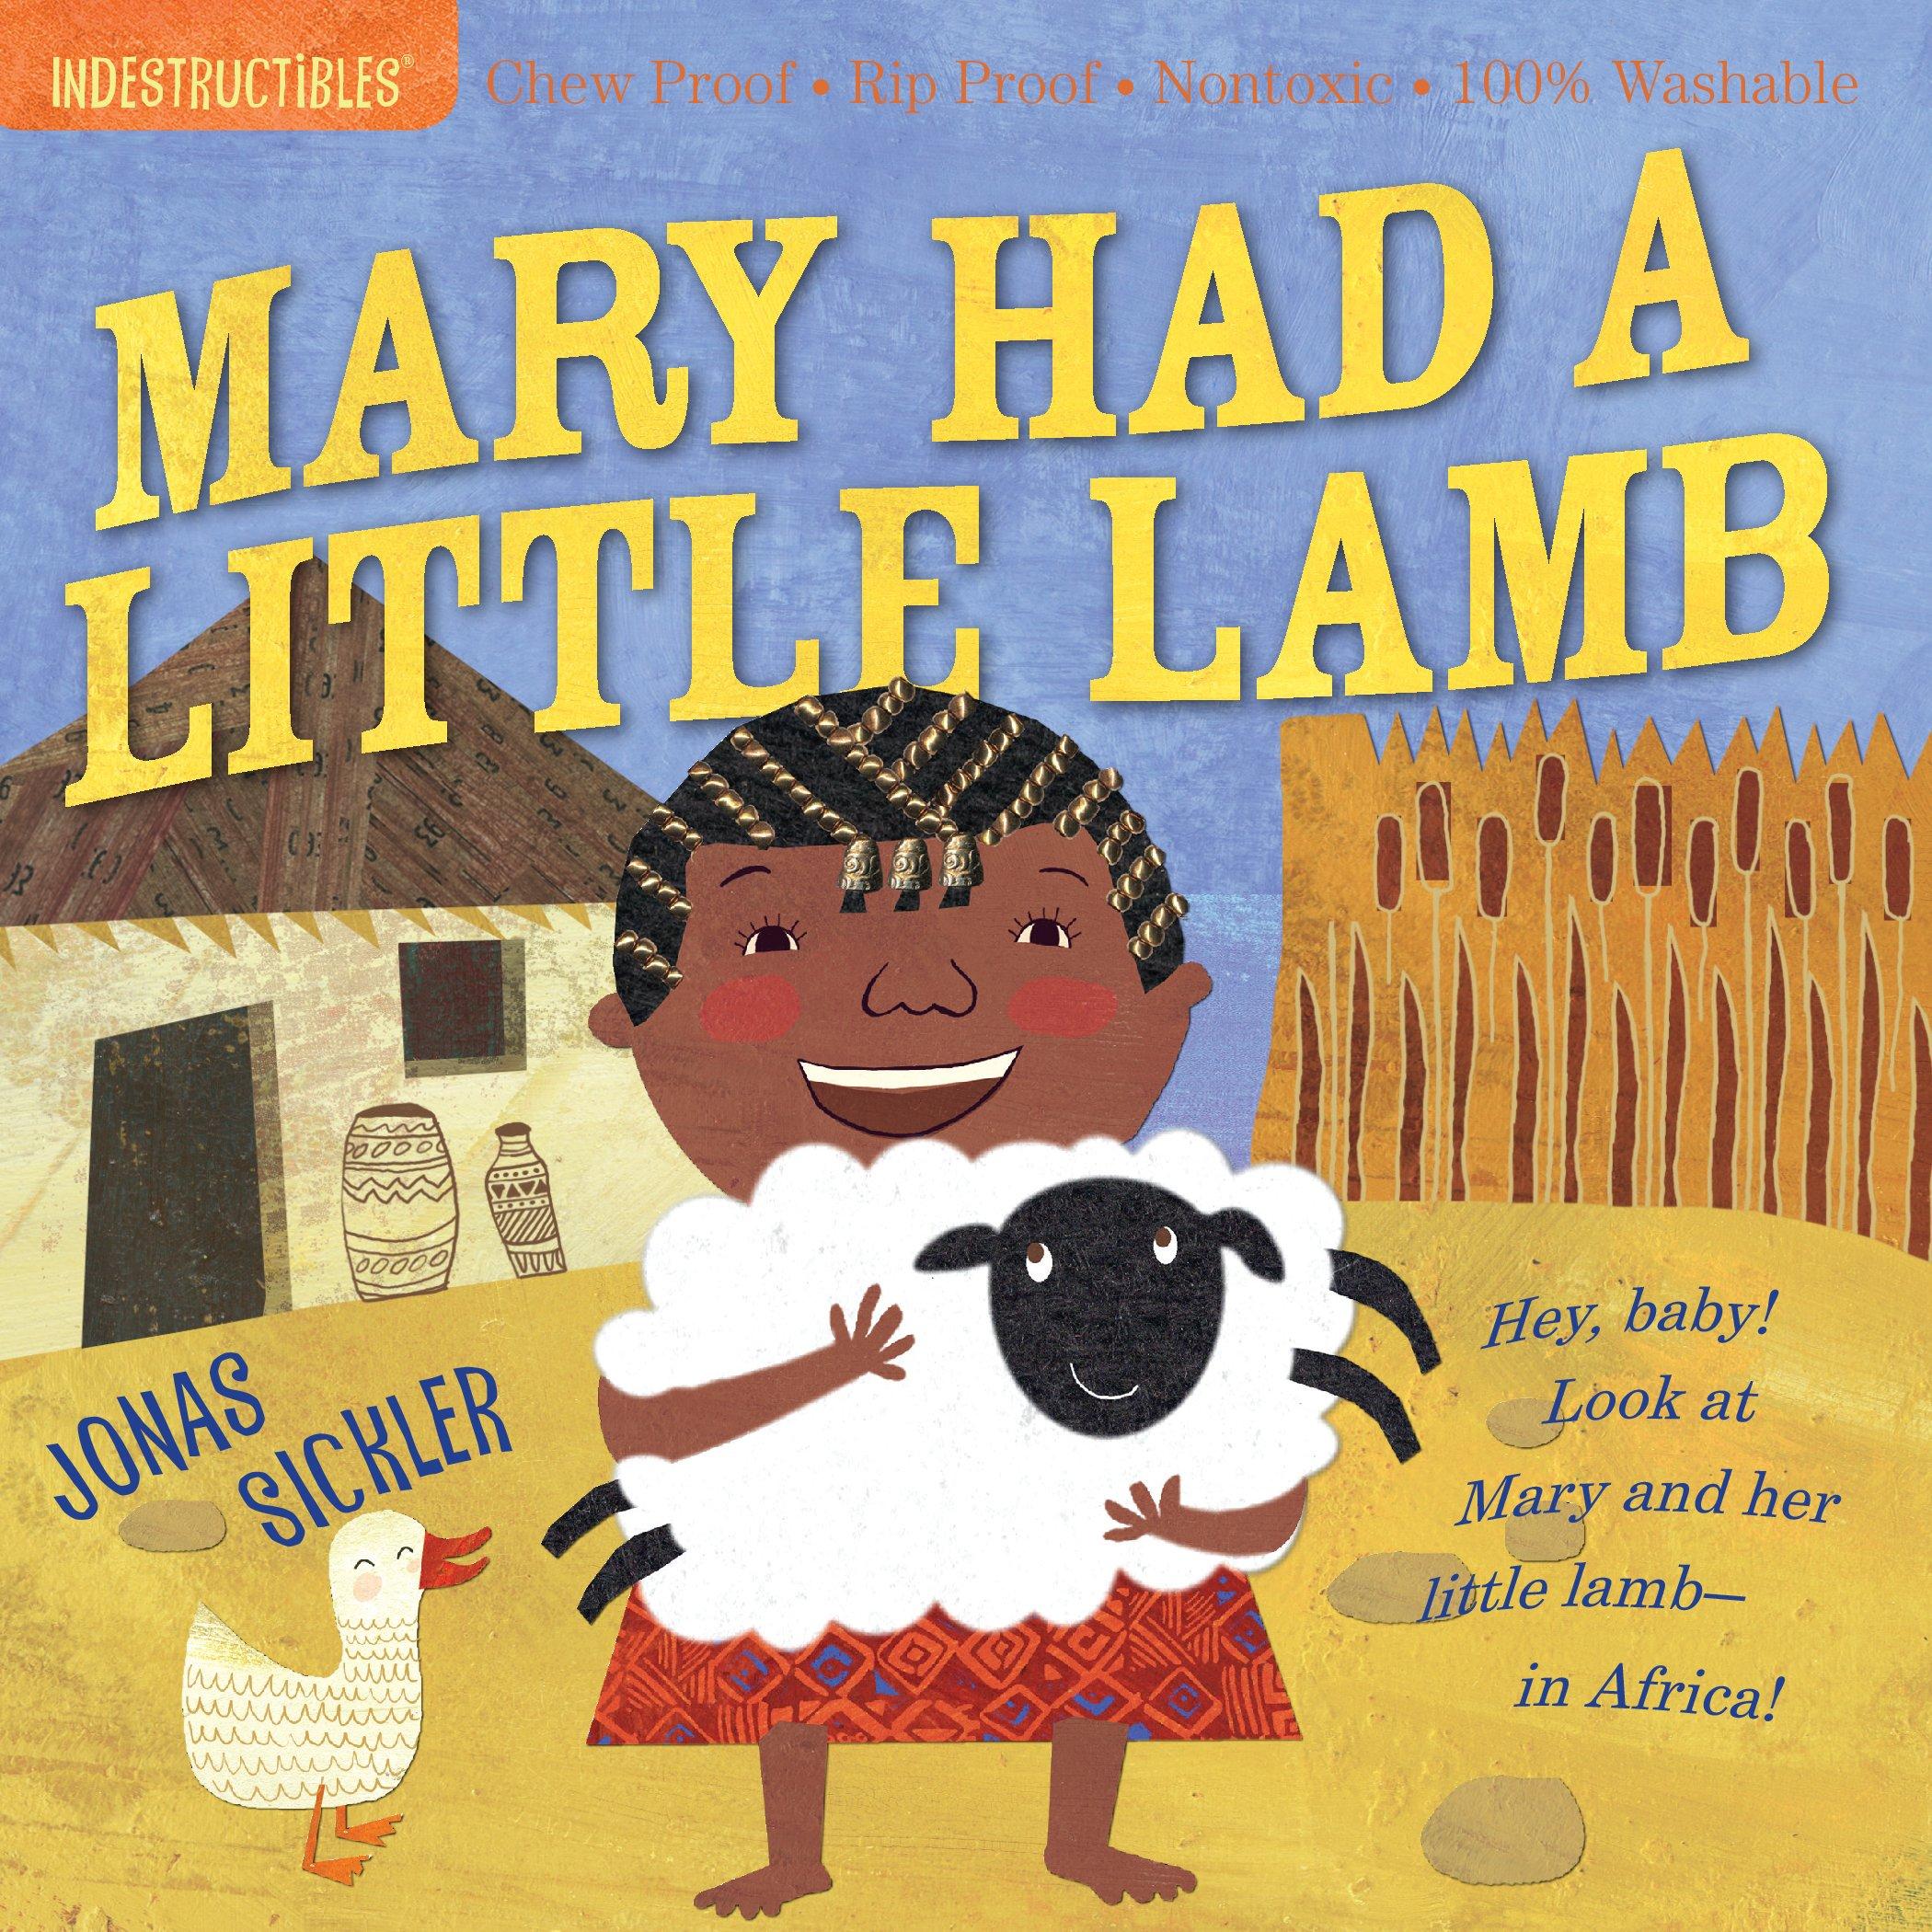 Indestructibles: Mary Had a Little Lamb